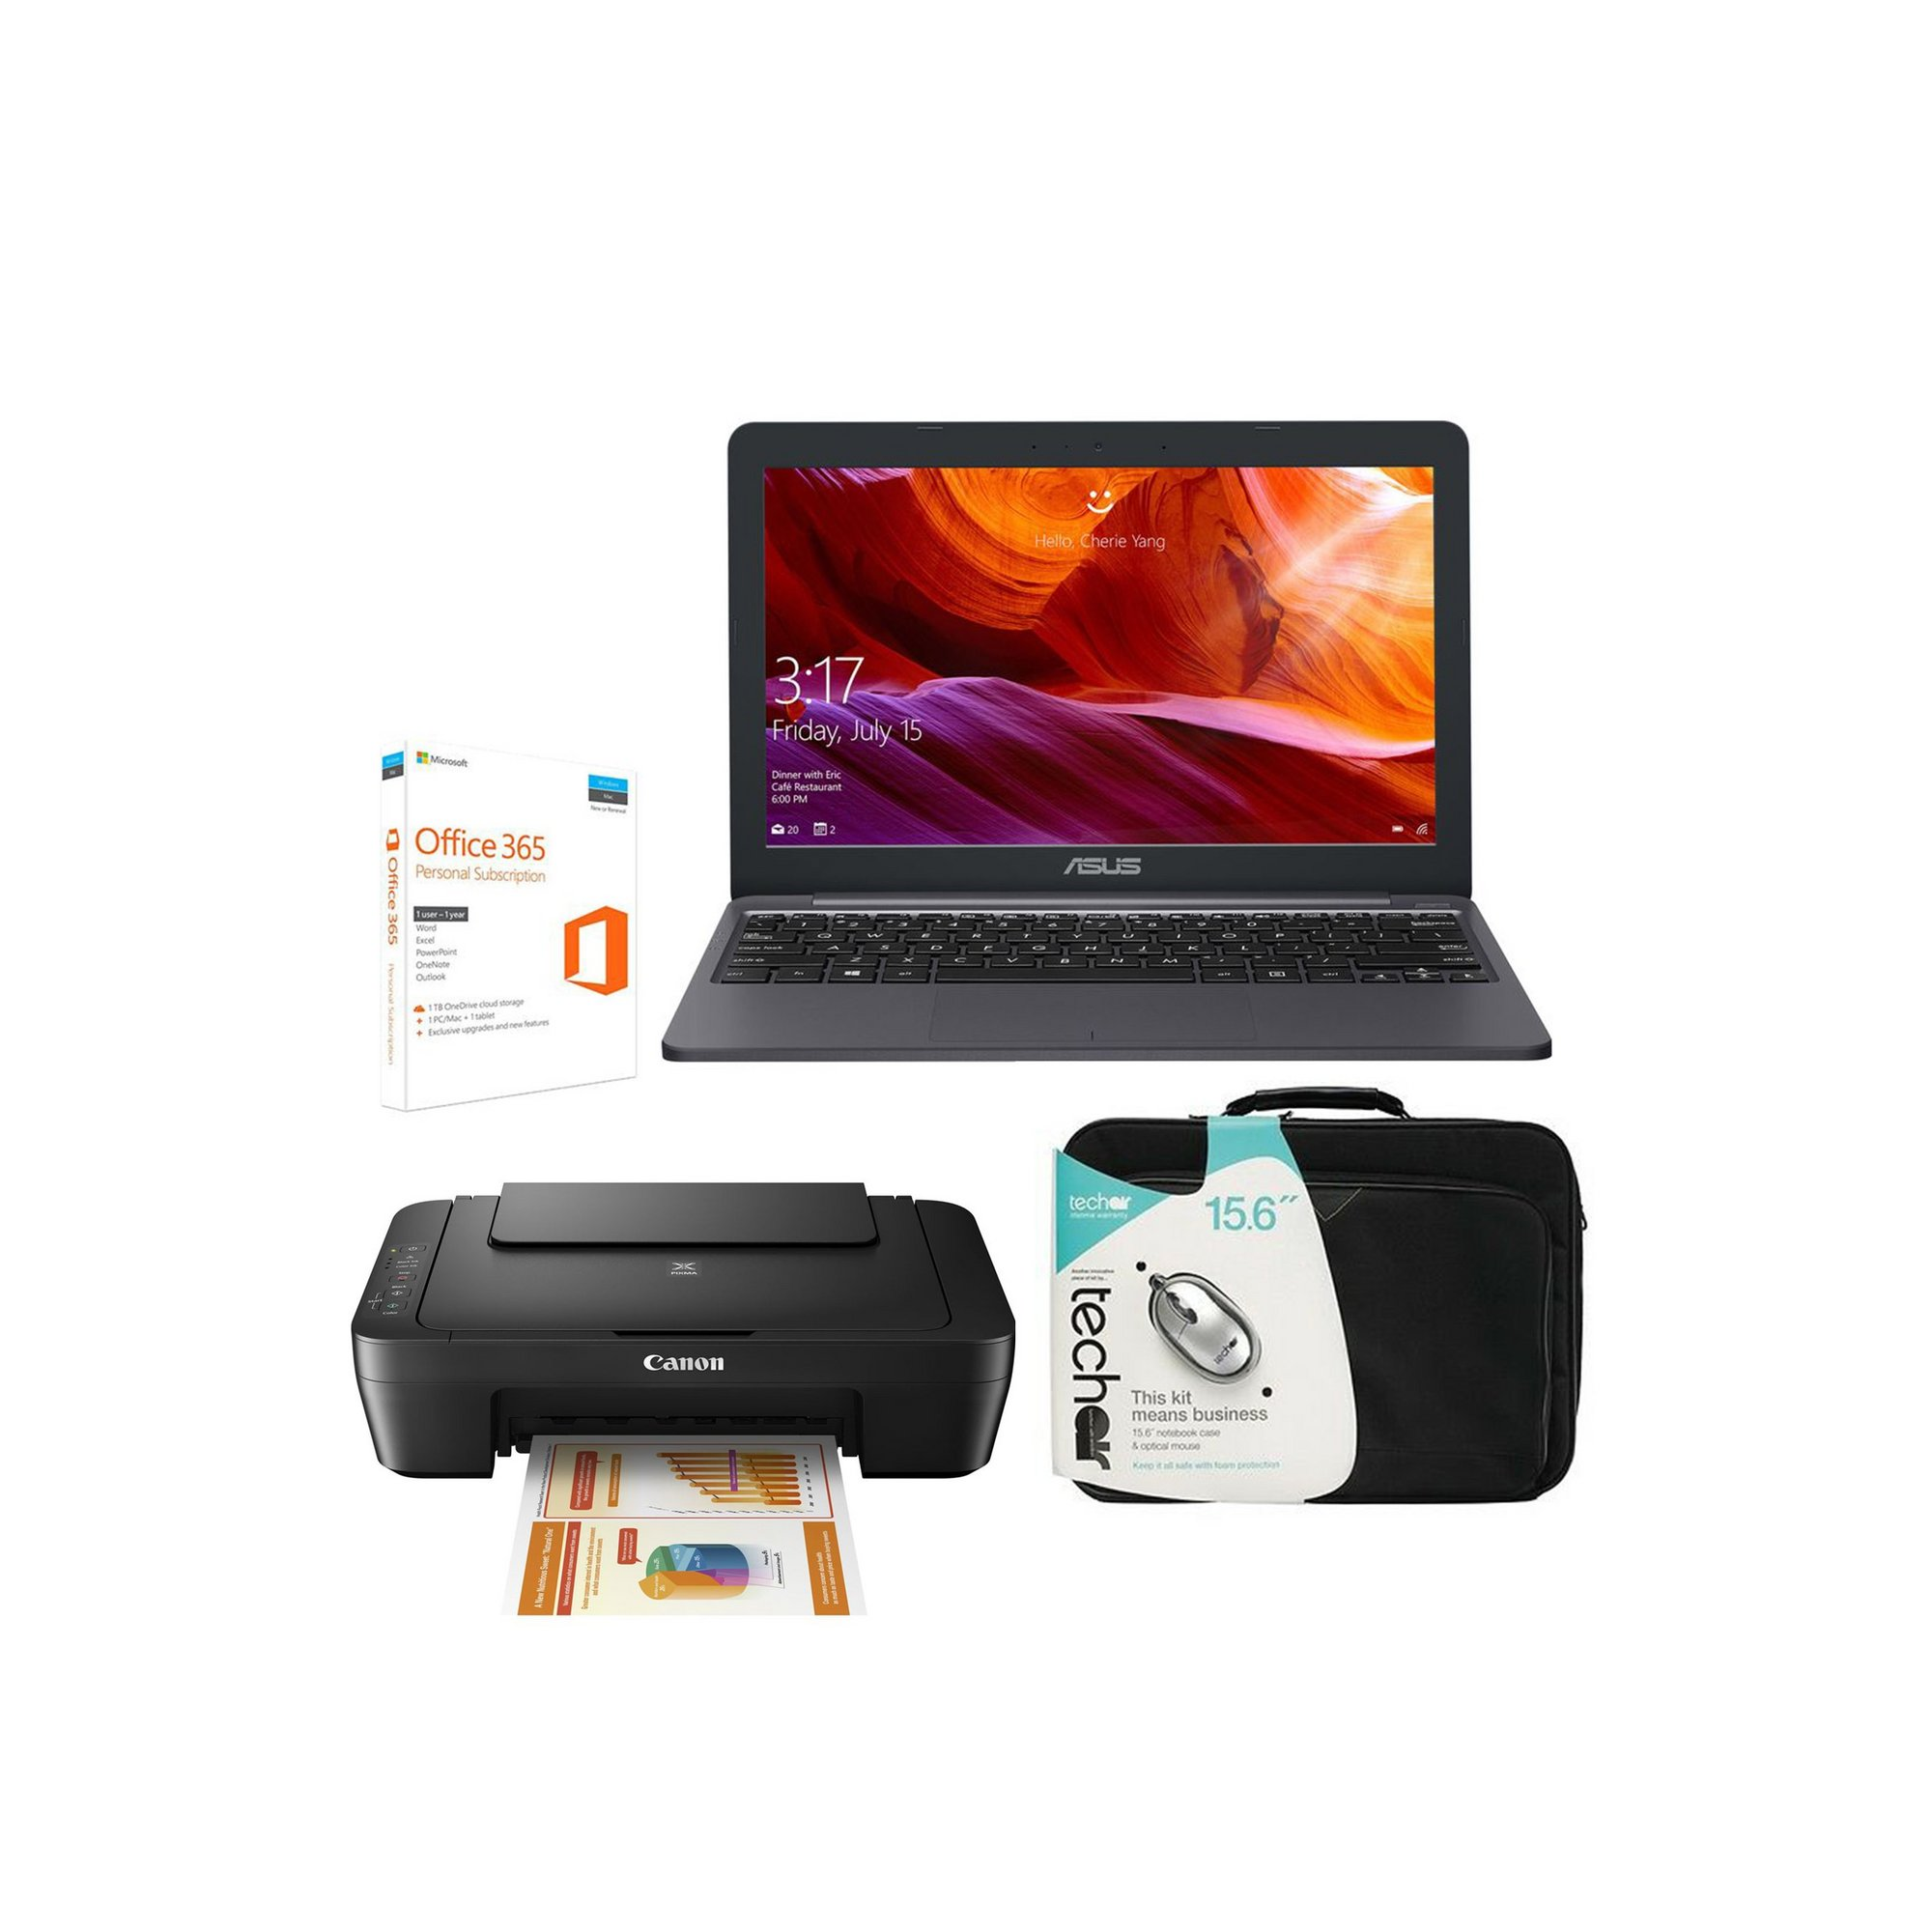 Image of ASUS 11.6 Inch Intel Celeron 64GB Laptop Office 365 Printer Bundle